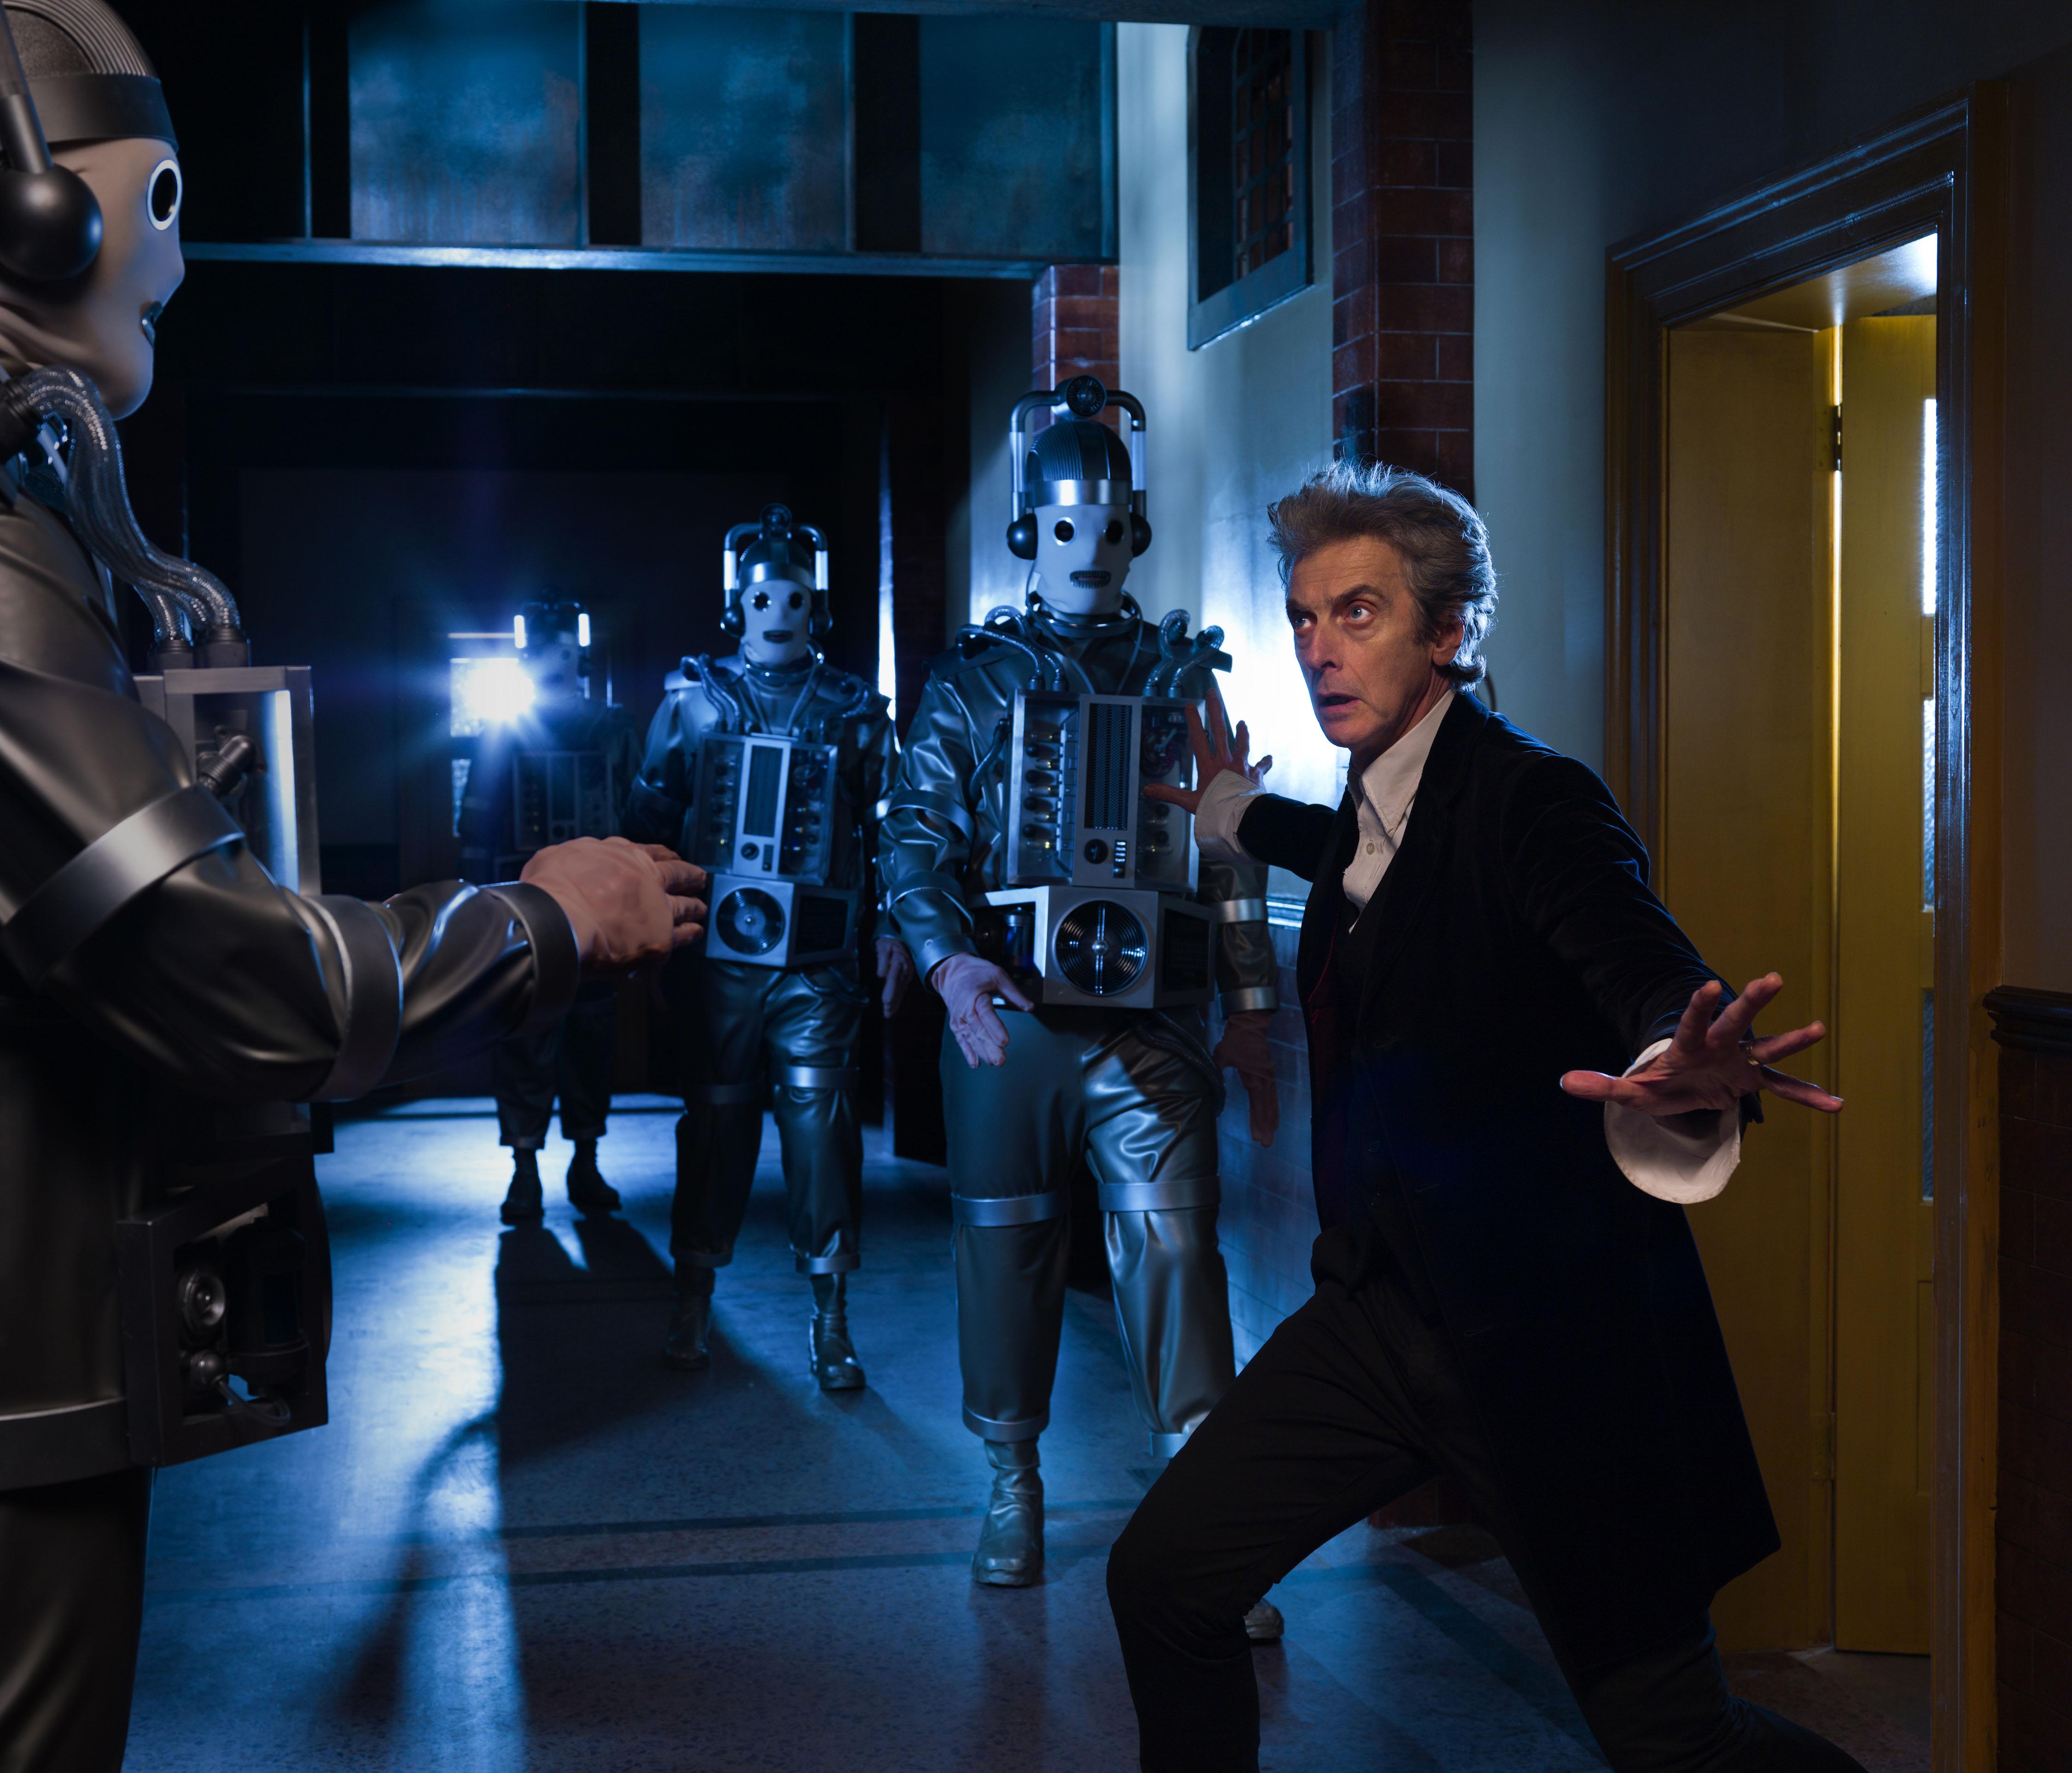 Doctor Who Season 10 Christmas Special.Doctor Who Series 10 Episode 11 12 On Set Photos